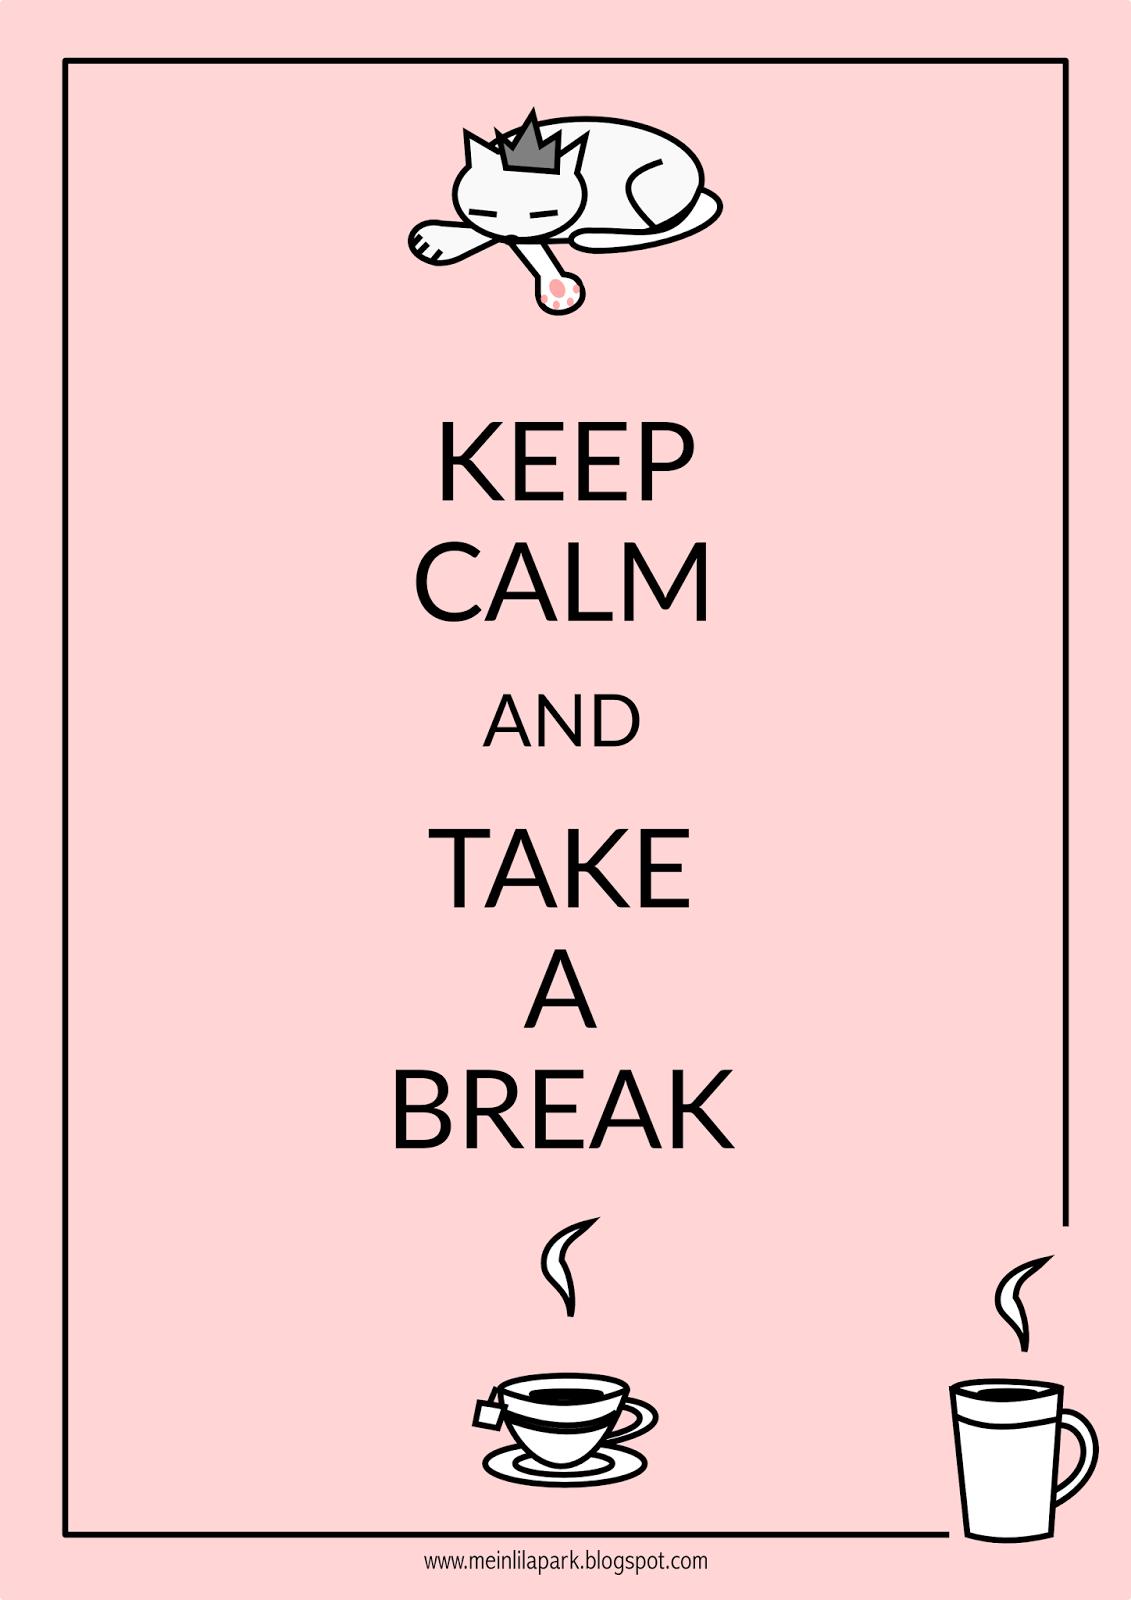 Free Printable Keep Calm And Take A Break Ausdruckbar